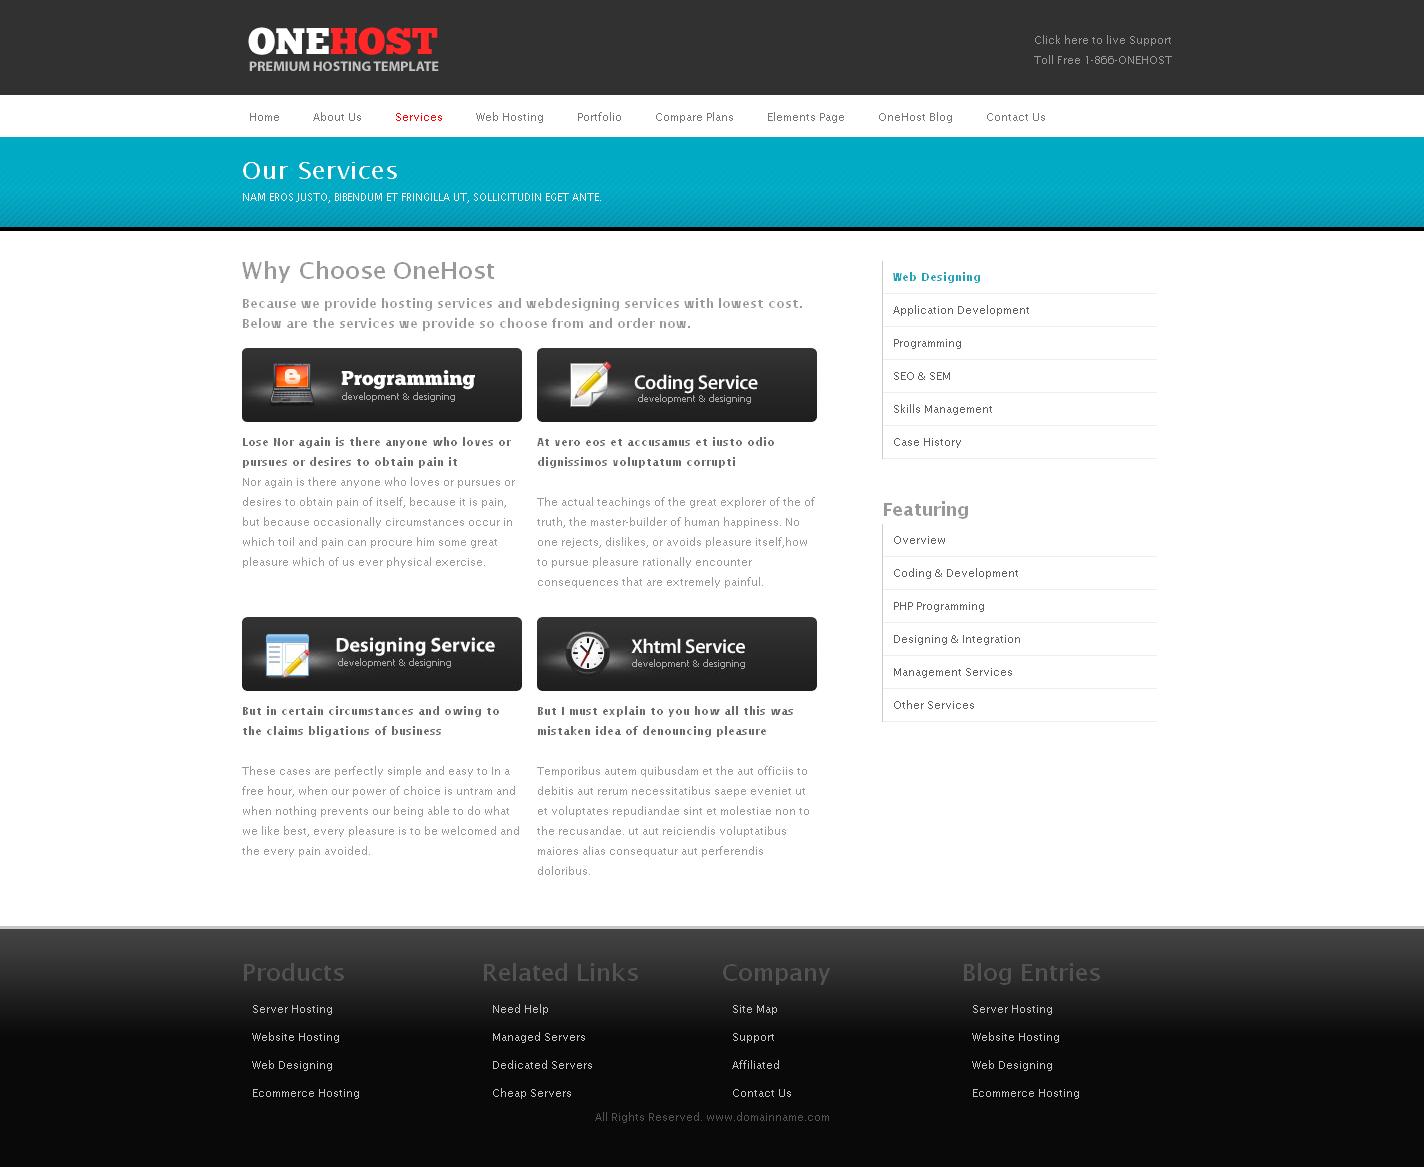 OneHost Preimum Hosting + Portfolio Template